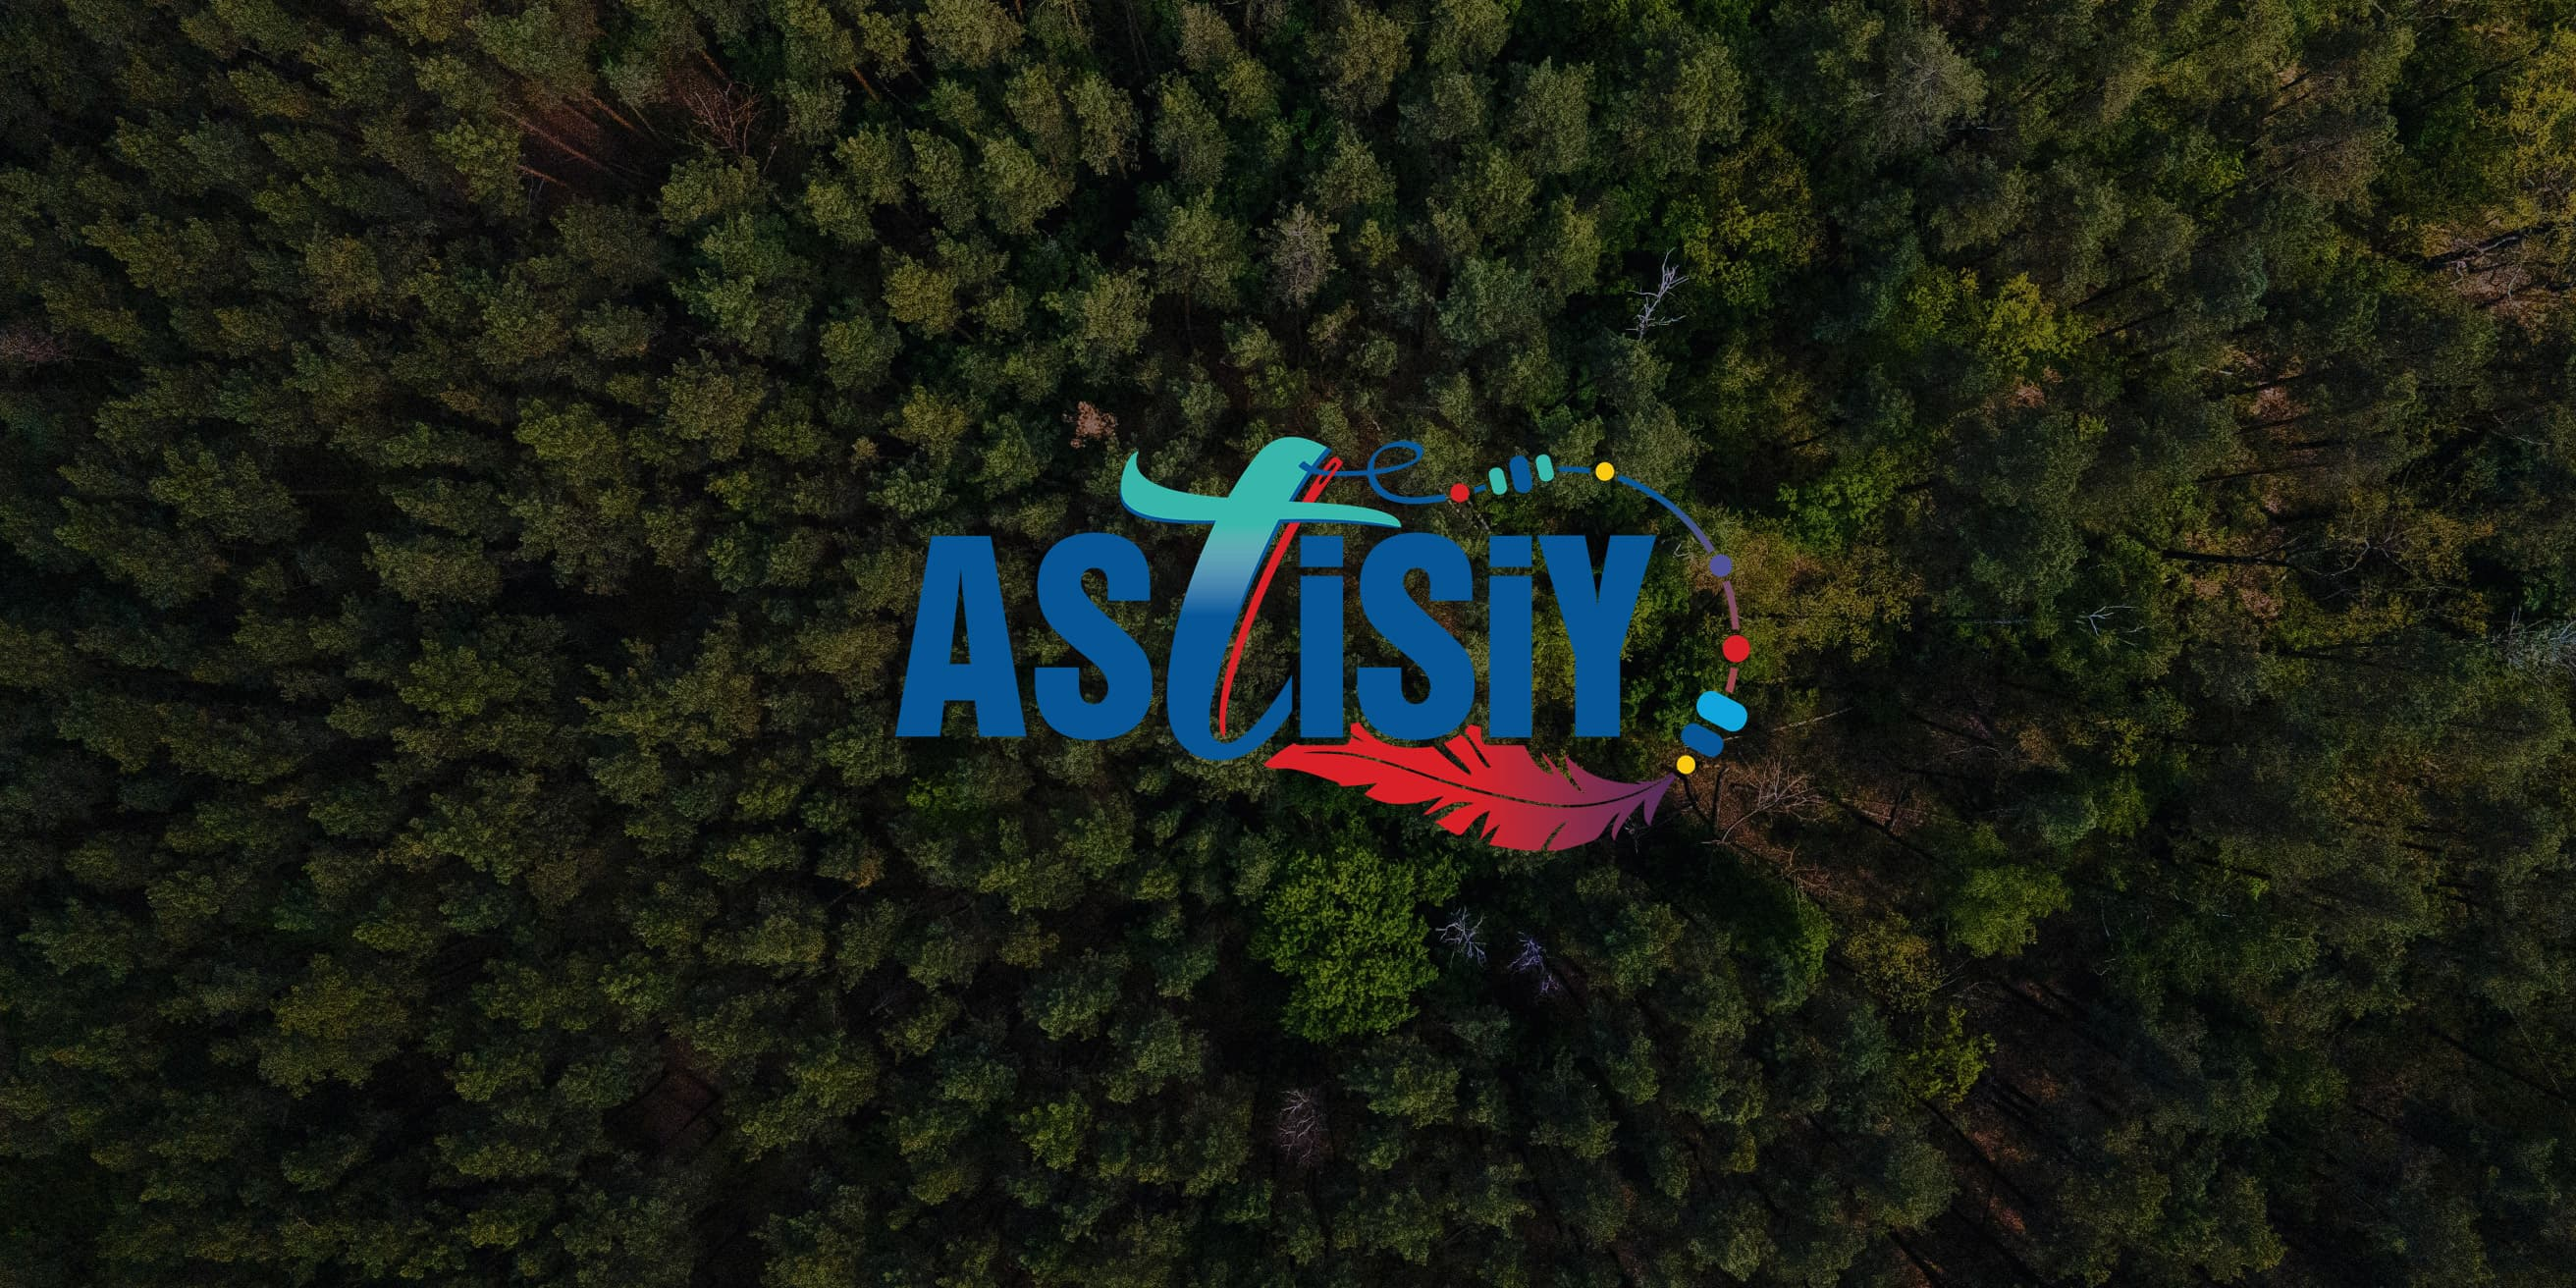 Astisiy logo on tree background.